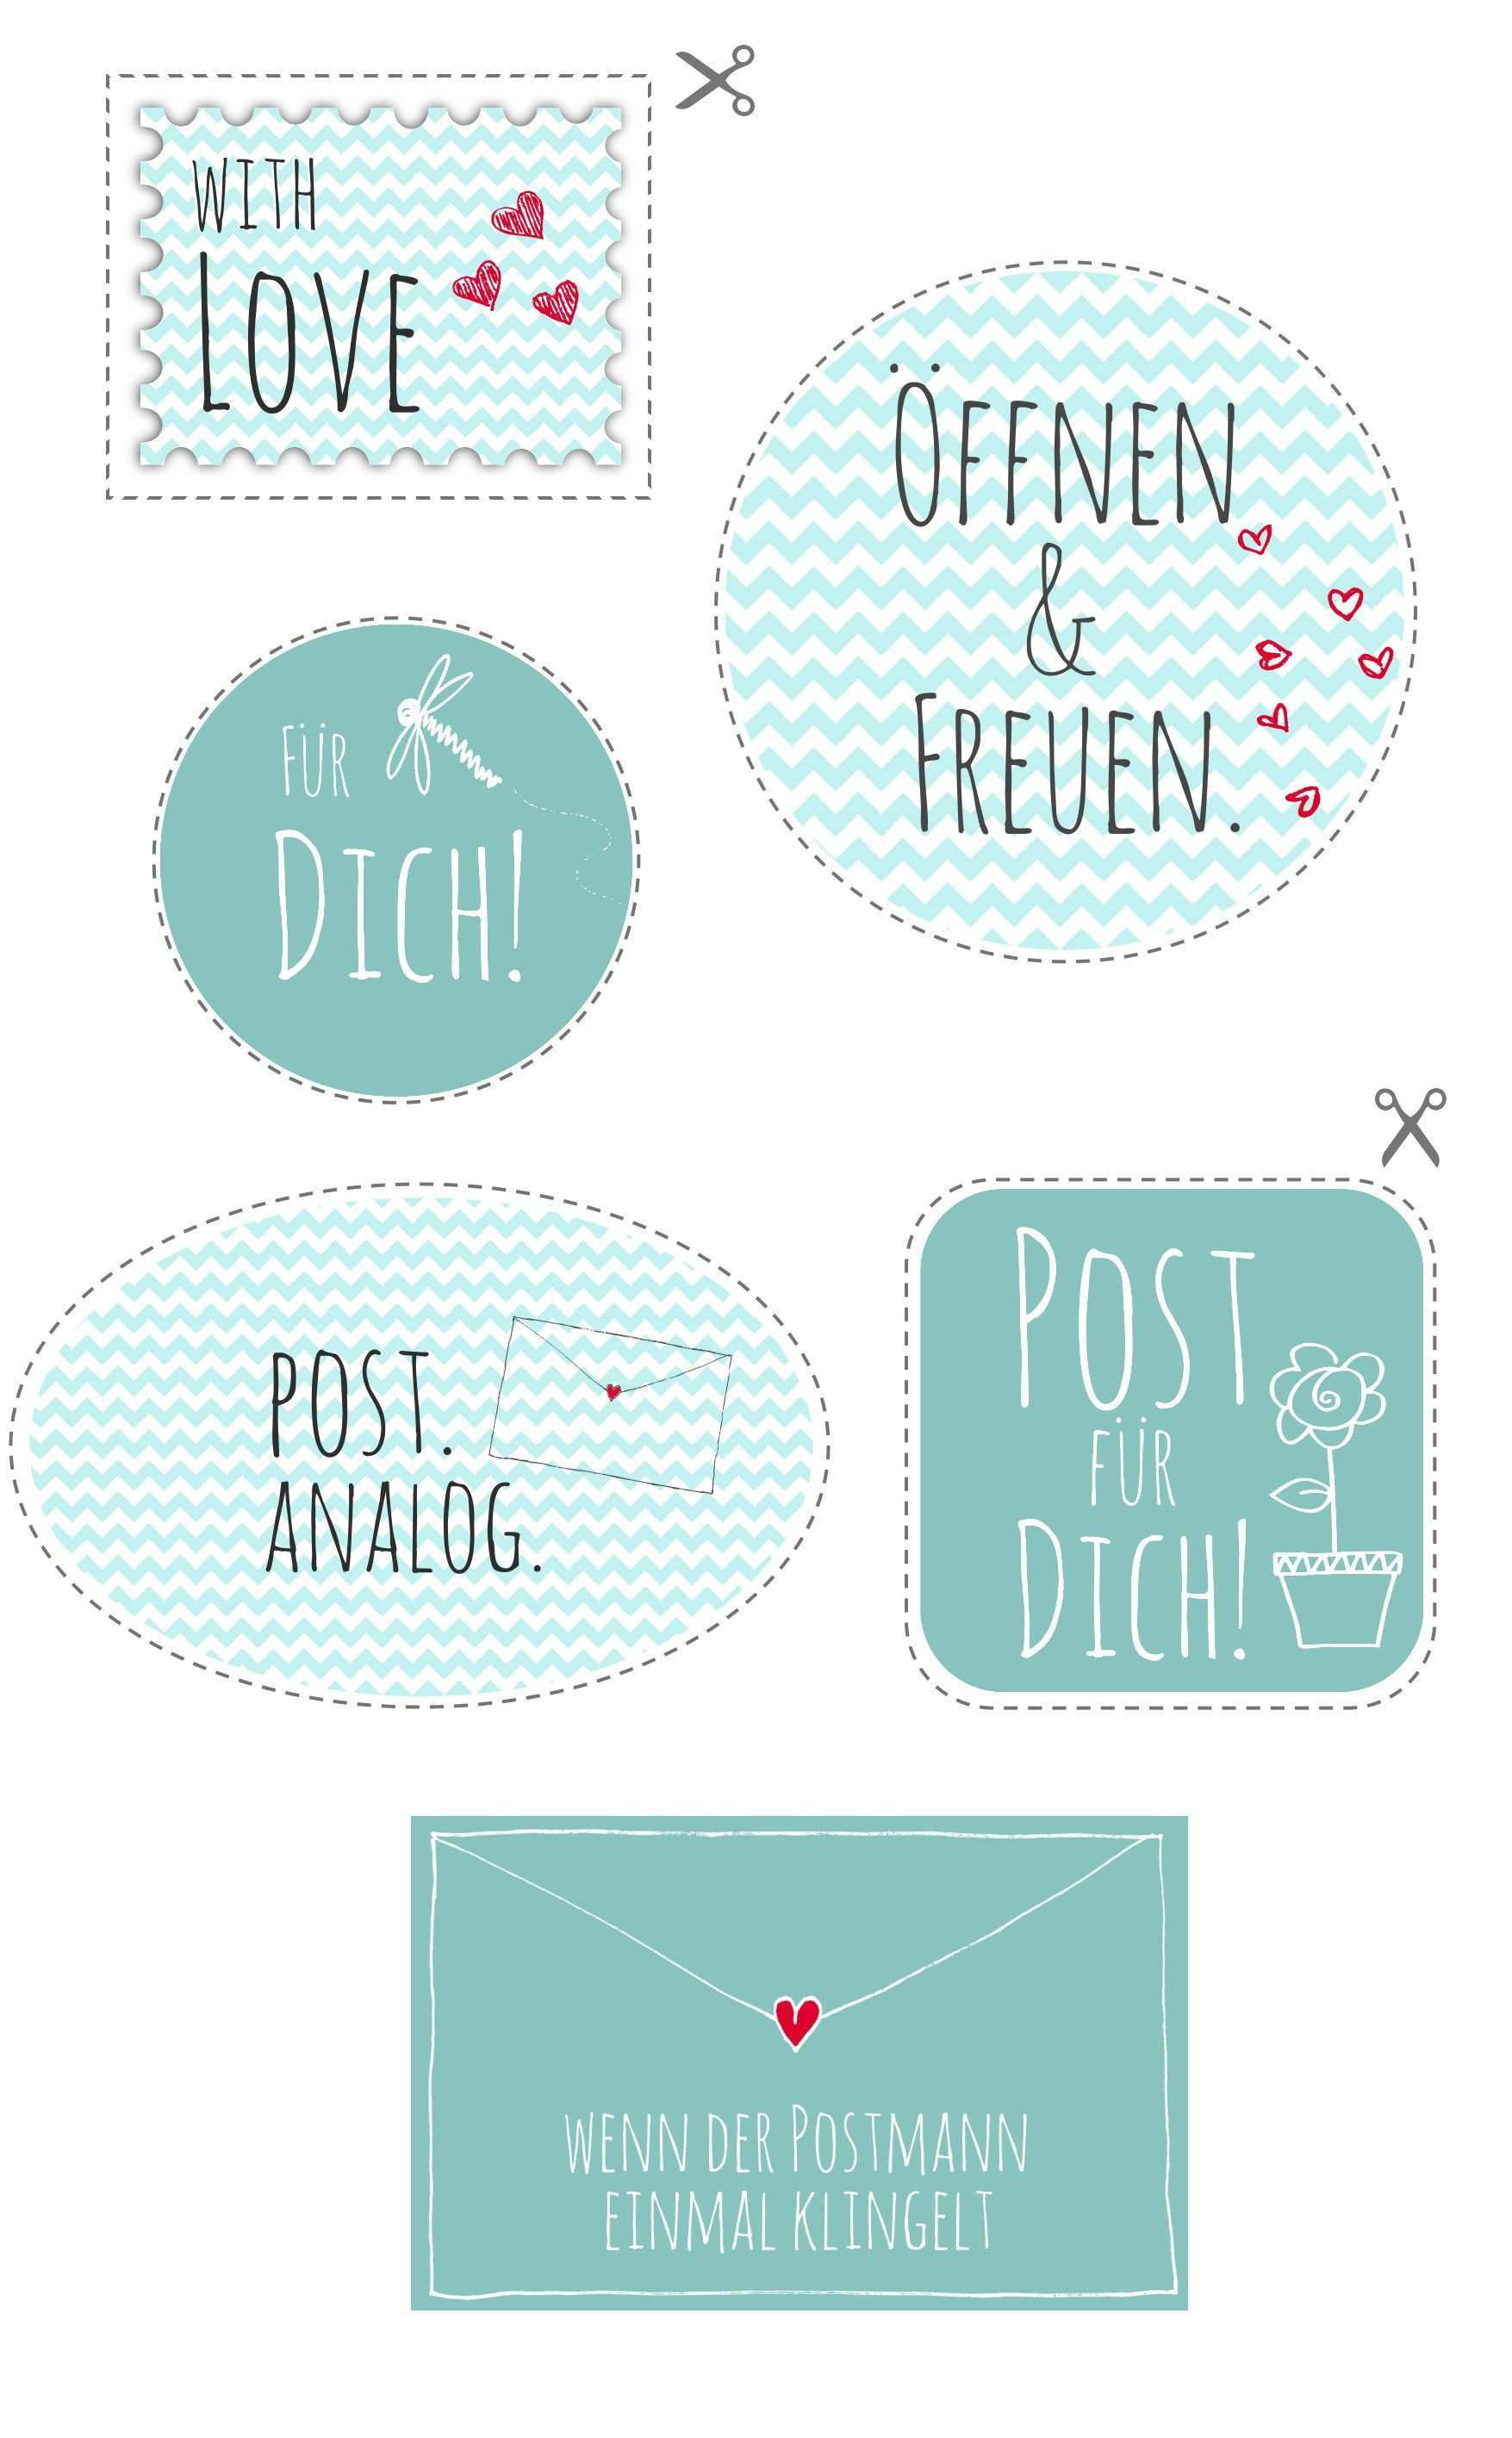 Printable Fur Analoge Post Printable For Sending Letters Via Blog Dawanda Com Etiketten Vorlagen Aufkleber Kostenlose Druckbare Etiketten